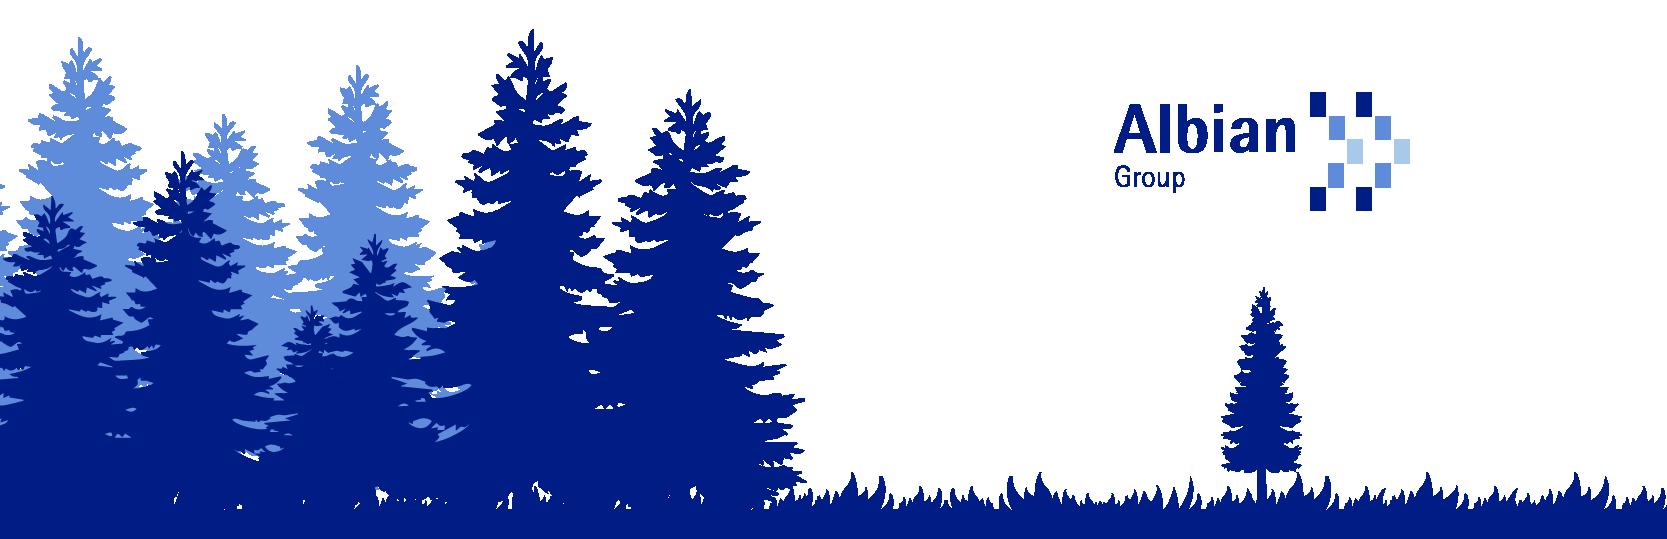 Bosque Albian Group